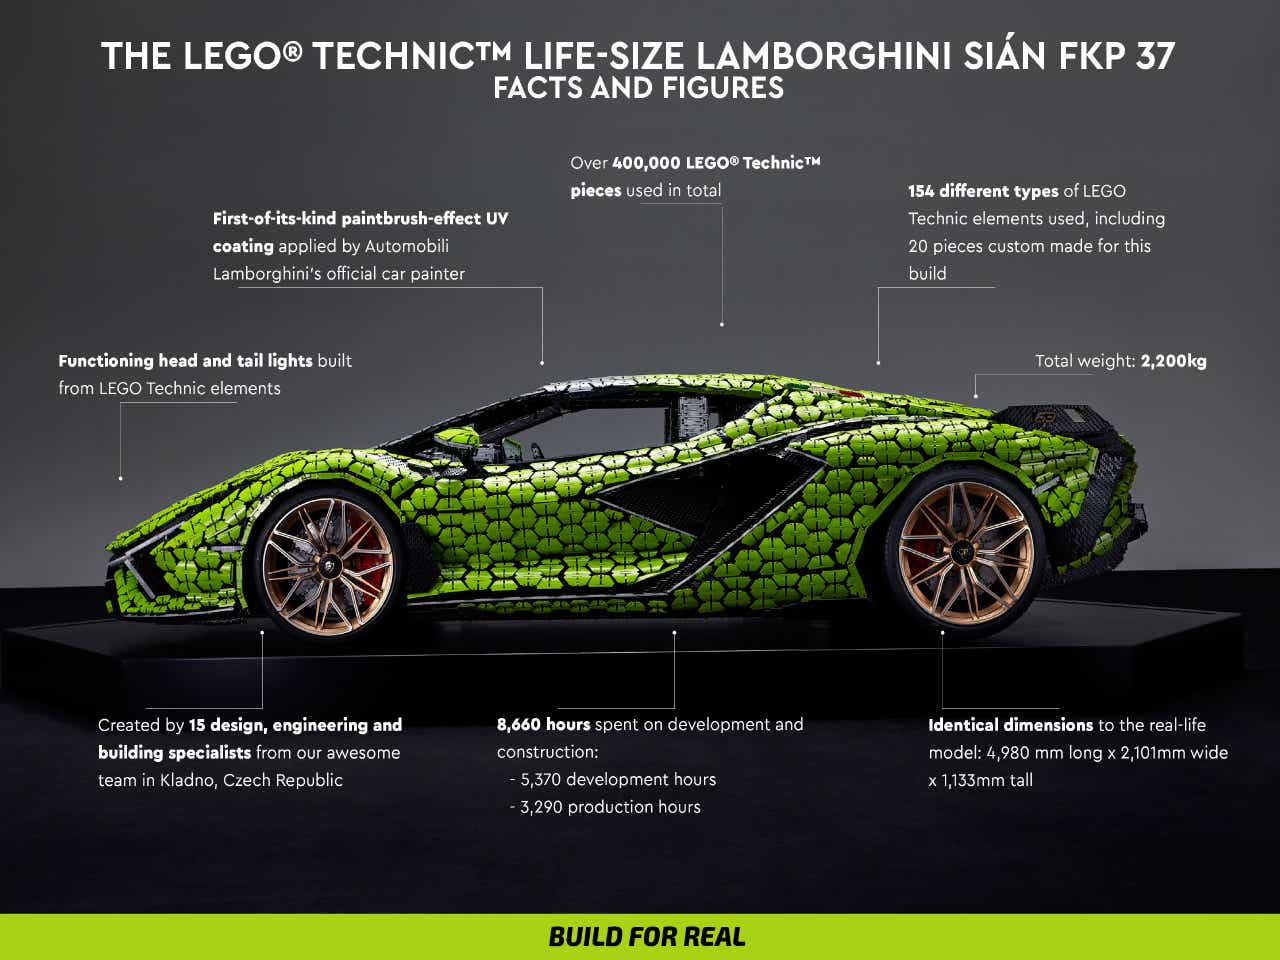 Lego Technic Sian FKP 37